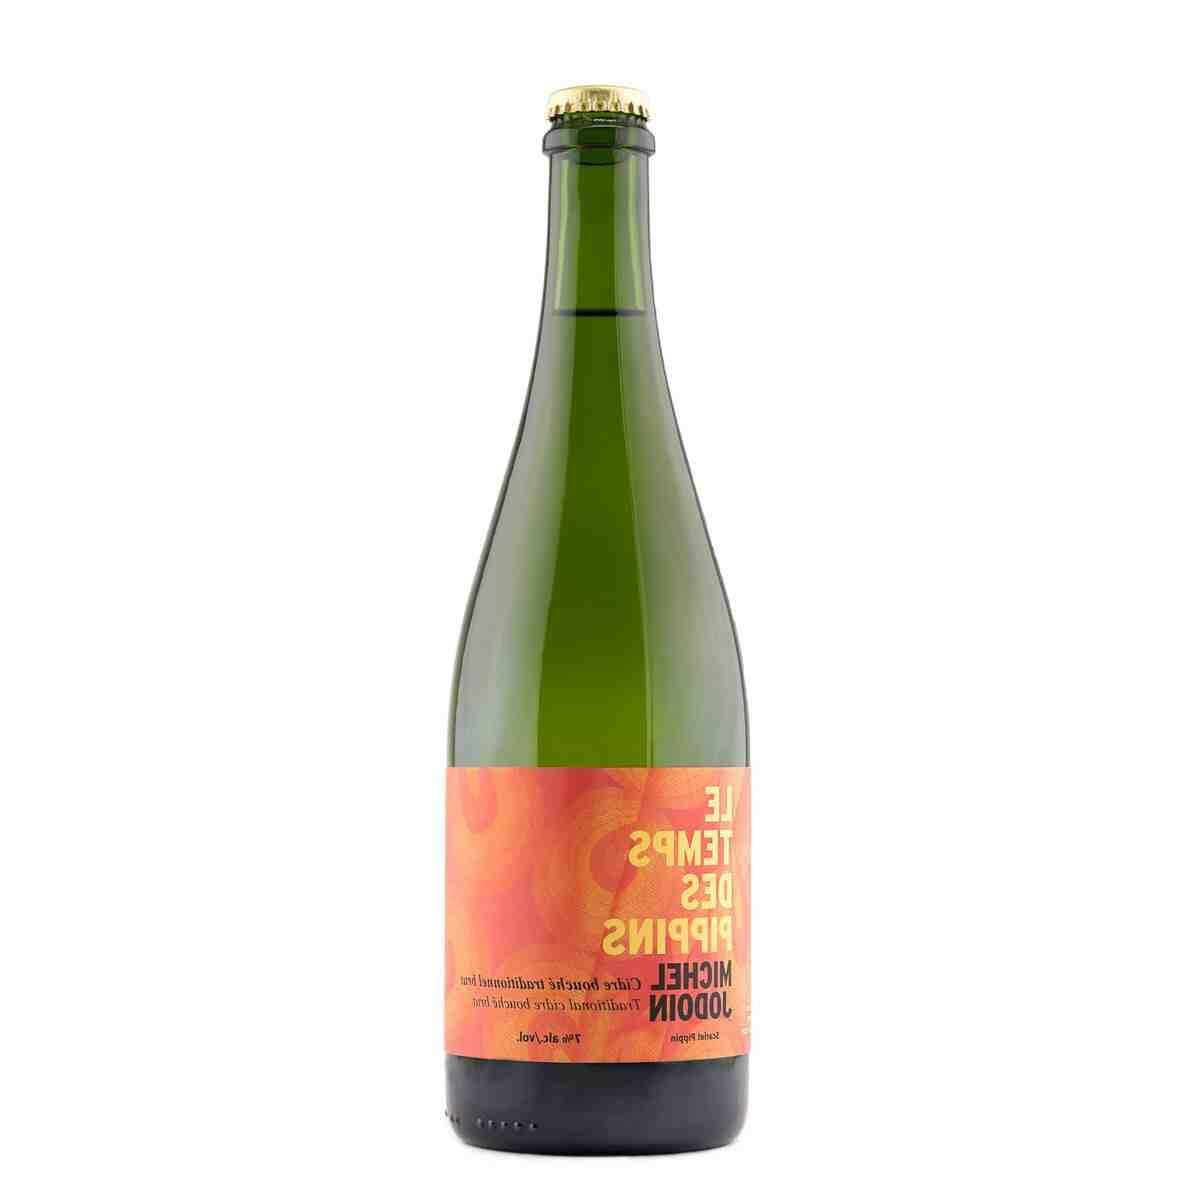 Quel vin Petillant choisir ?